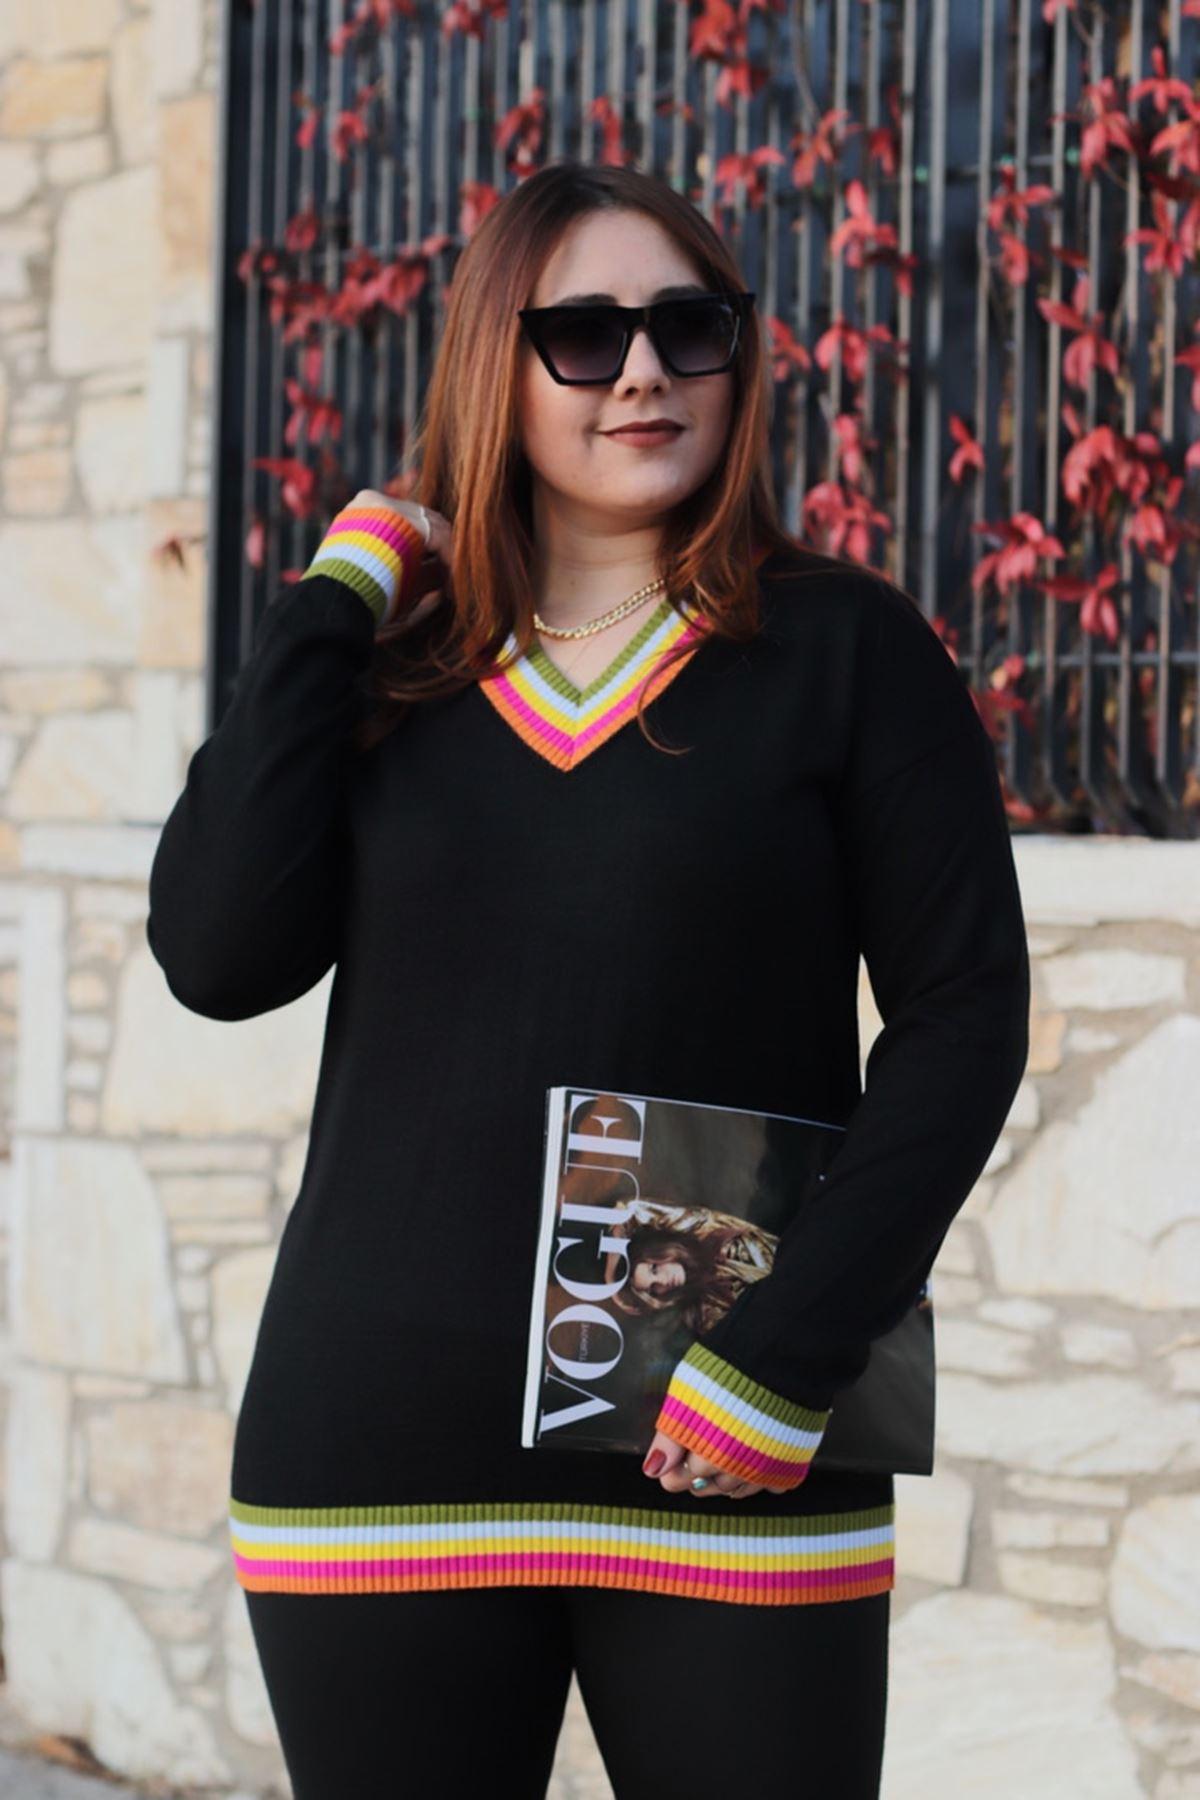 RENKTE V YAKA YAKASI RENKLİ SİYAH TRİKO KAZAK